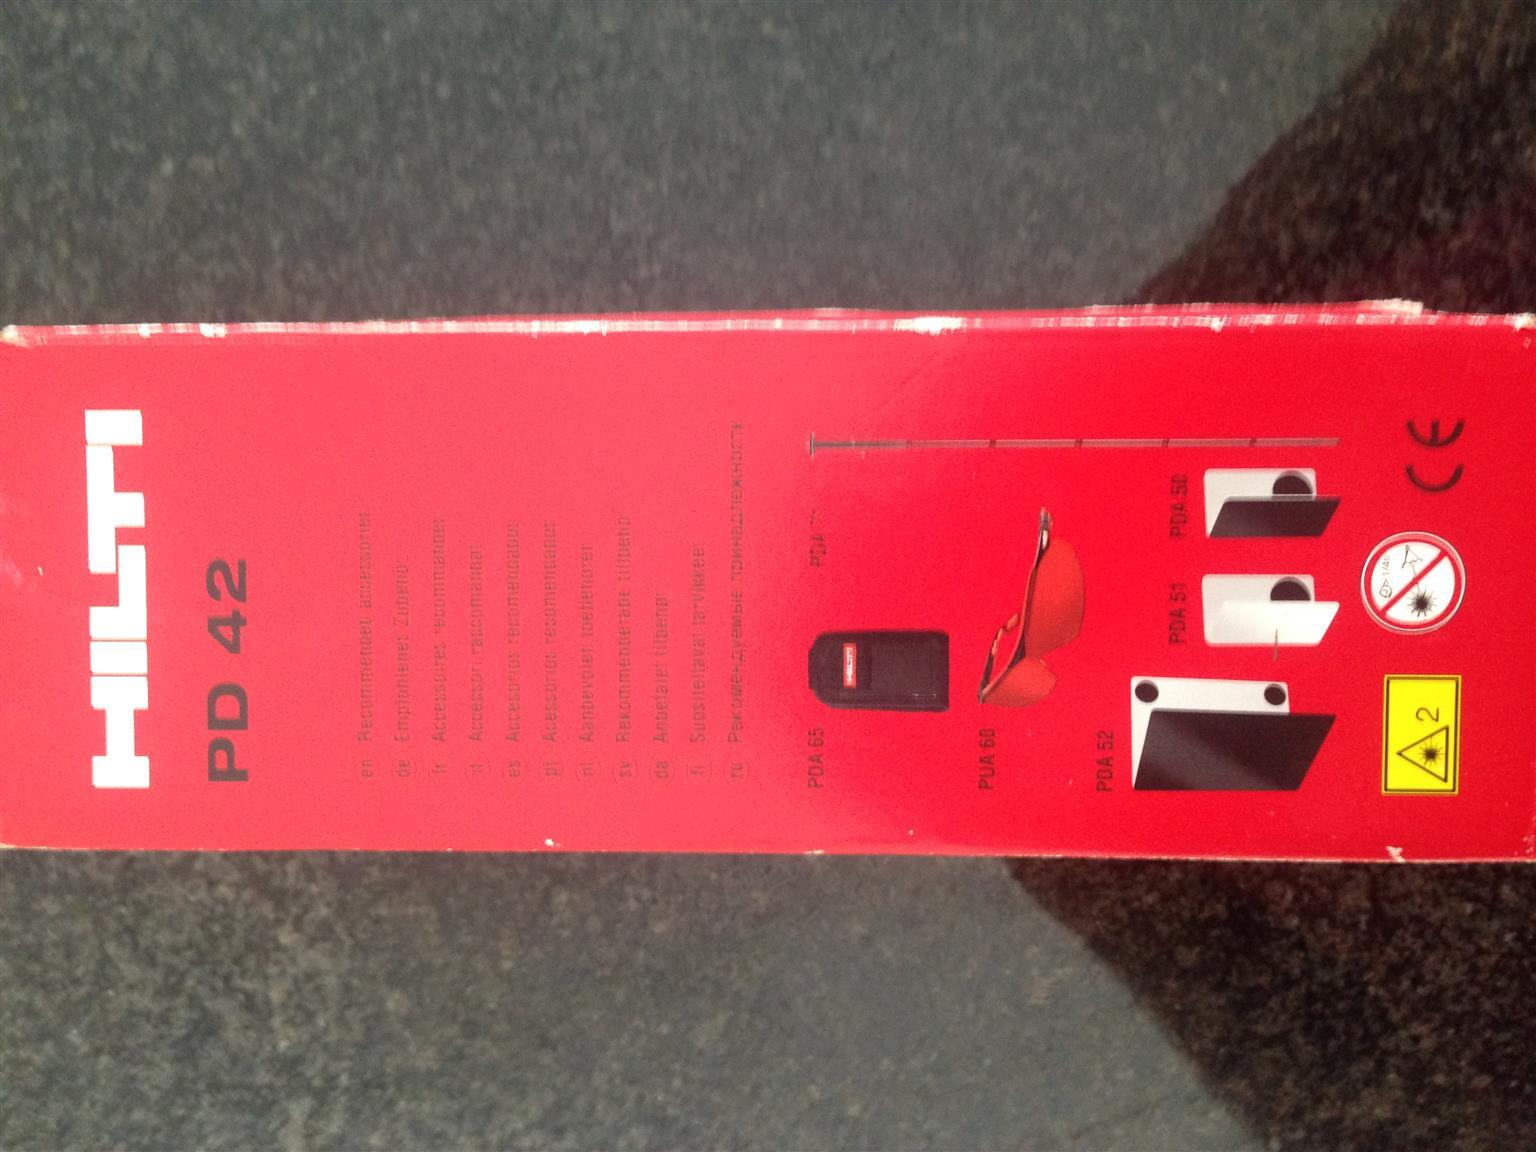 Laser Entfernungsmesser Hilti Pd 42 : Hilti pd laser range meter junk mail